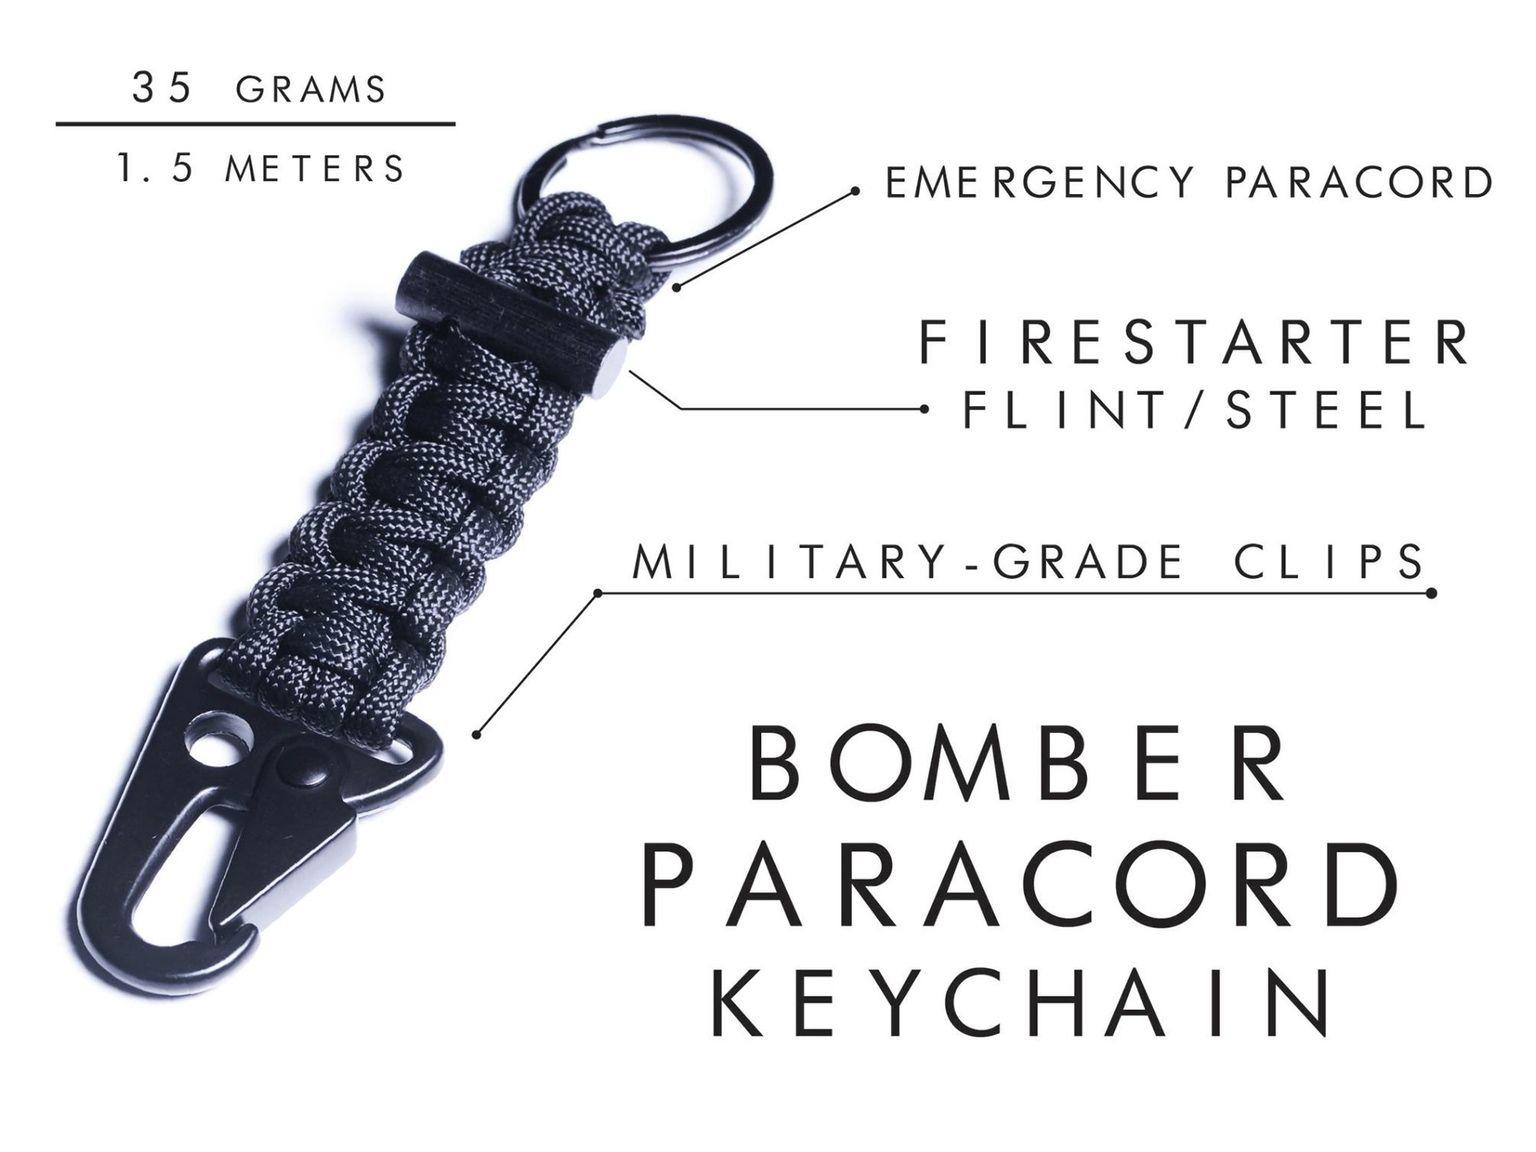 Firestarter Paracord Bracelet, Paracord Keychain, Duffle Bag Survival Gear by Bomber & Company